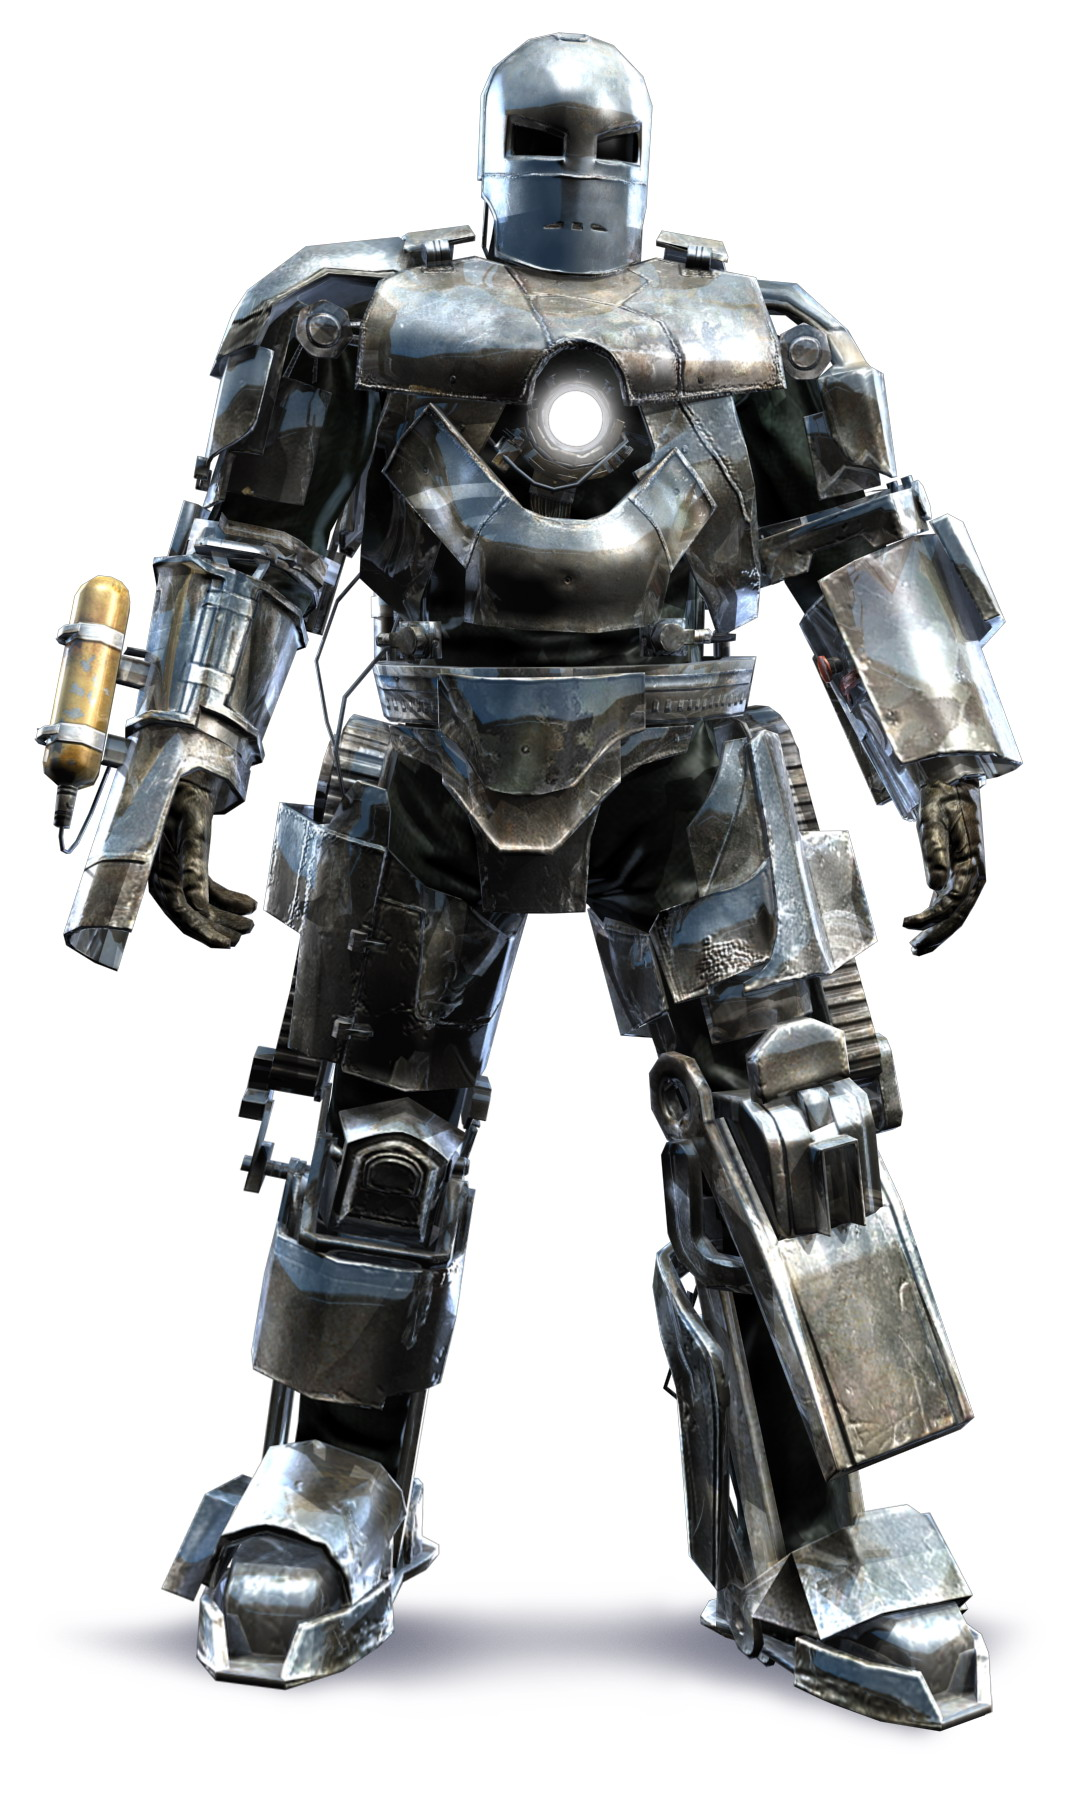 Mark i iron man wiki fandom powered by wikia - Iron man 1 images ...